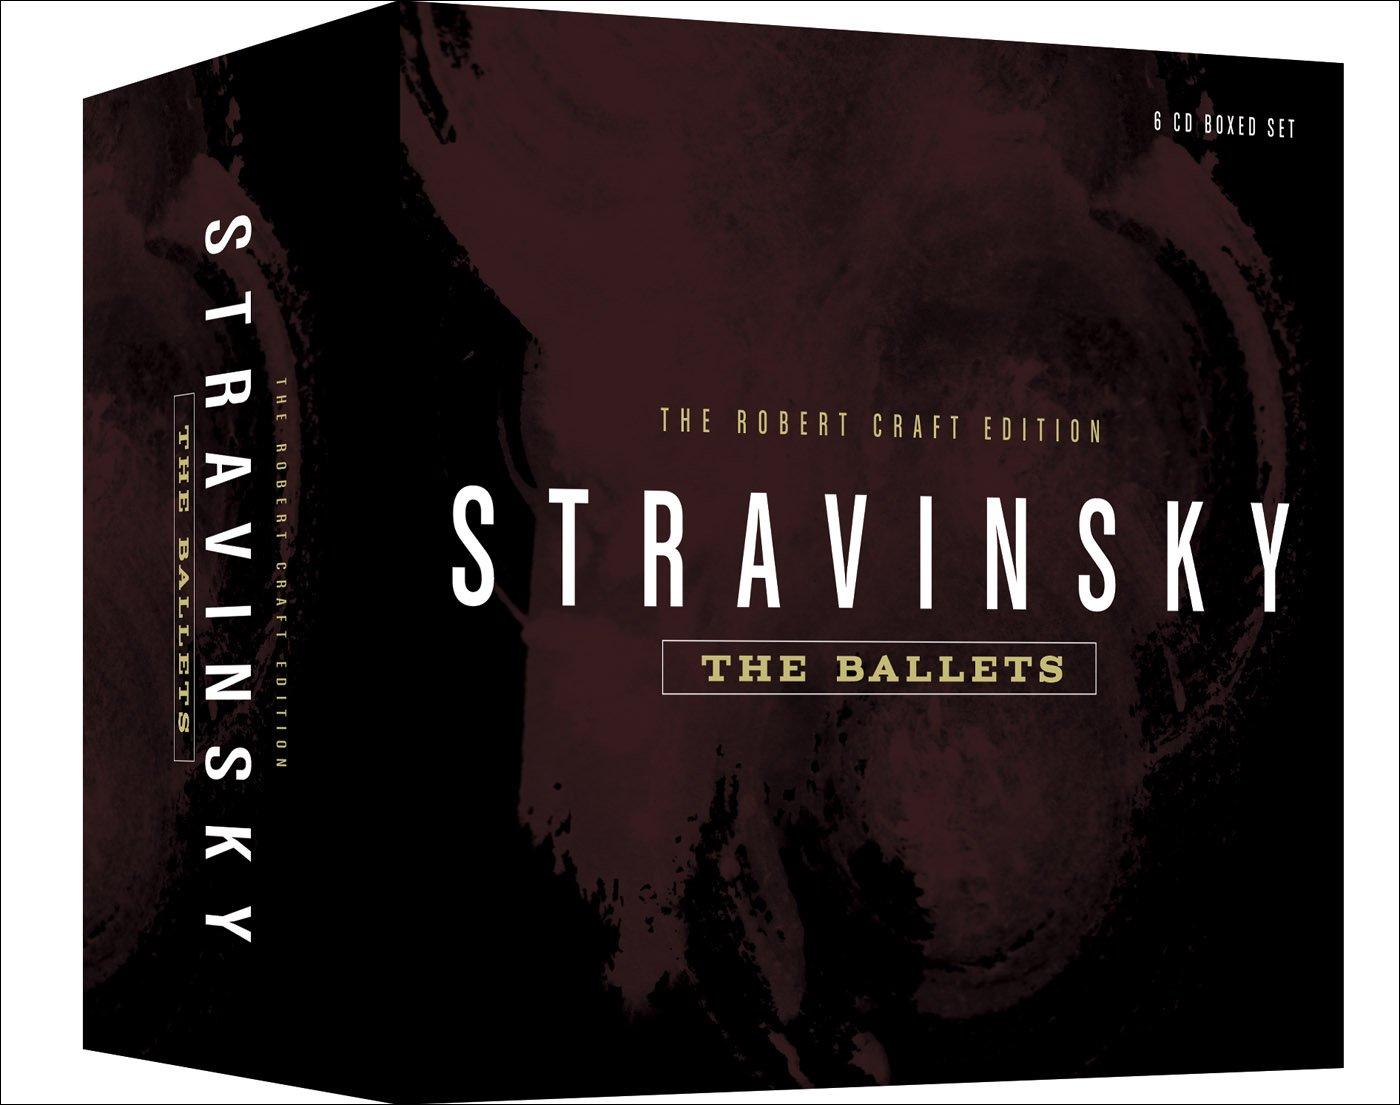 The Robert Craft Edition - Stravinsky: The Ballets